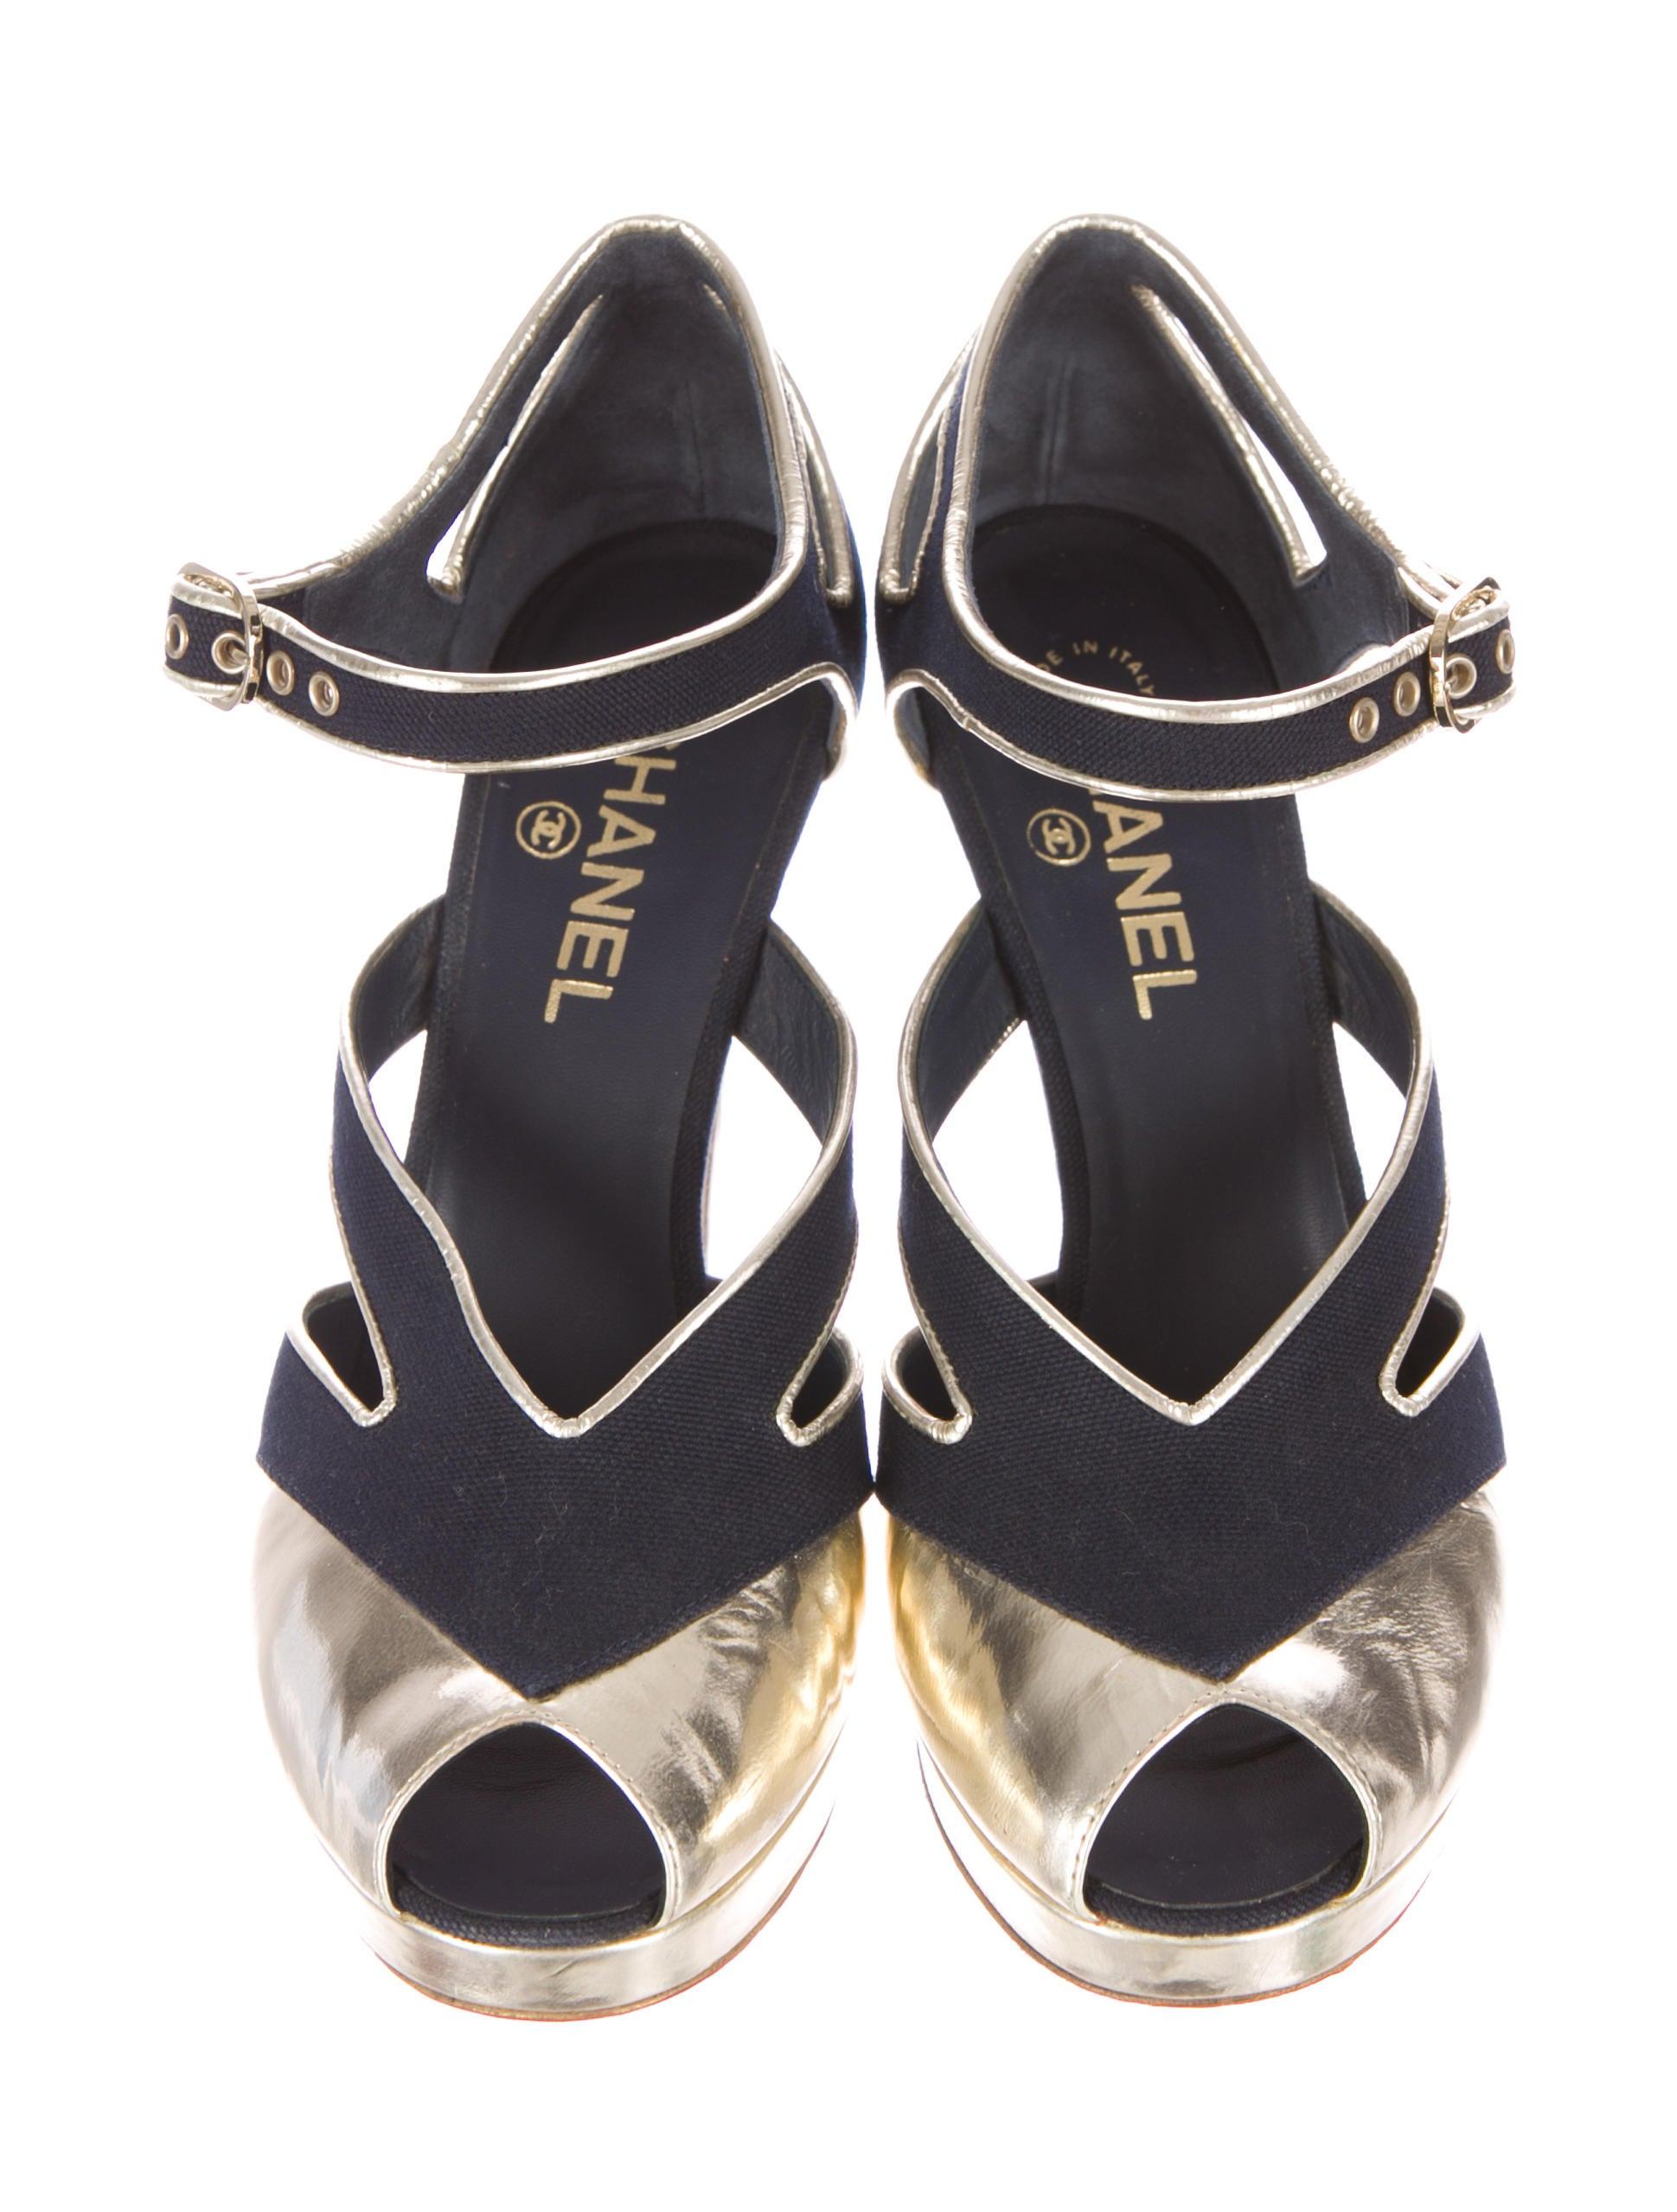 chanel peep toe platform pumps shoes cha69610 the